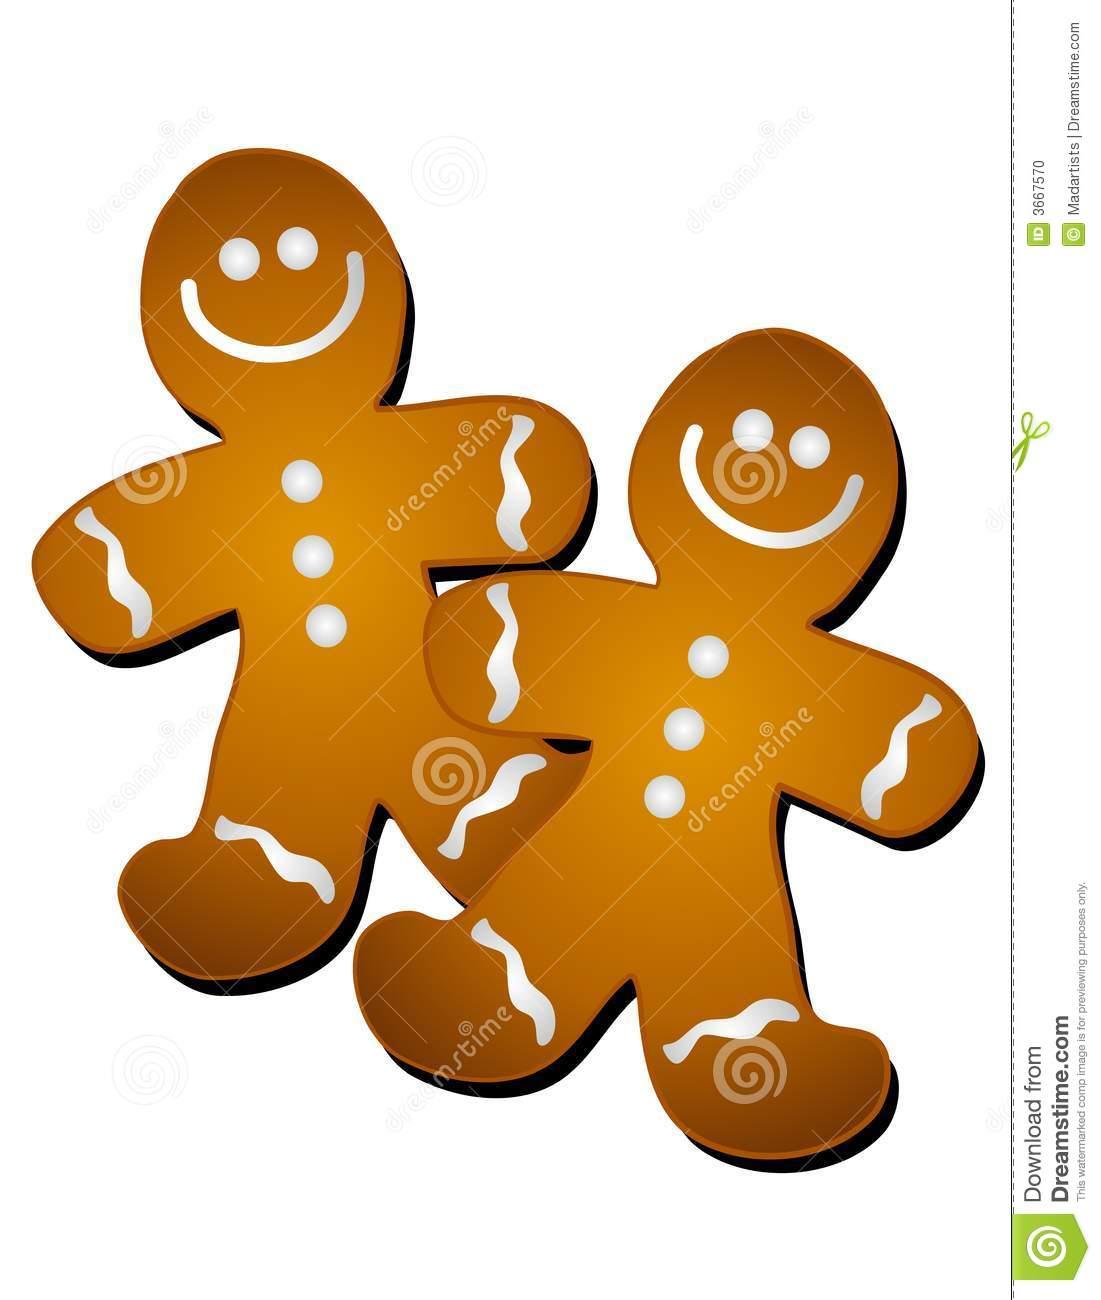 Gingerbread Man Cookies Clip Art Stock Illustration.